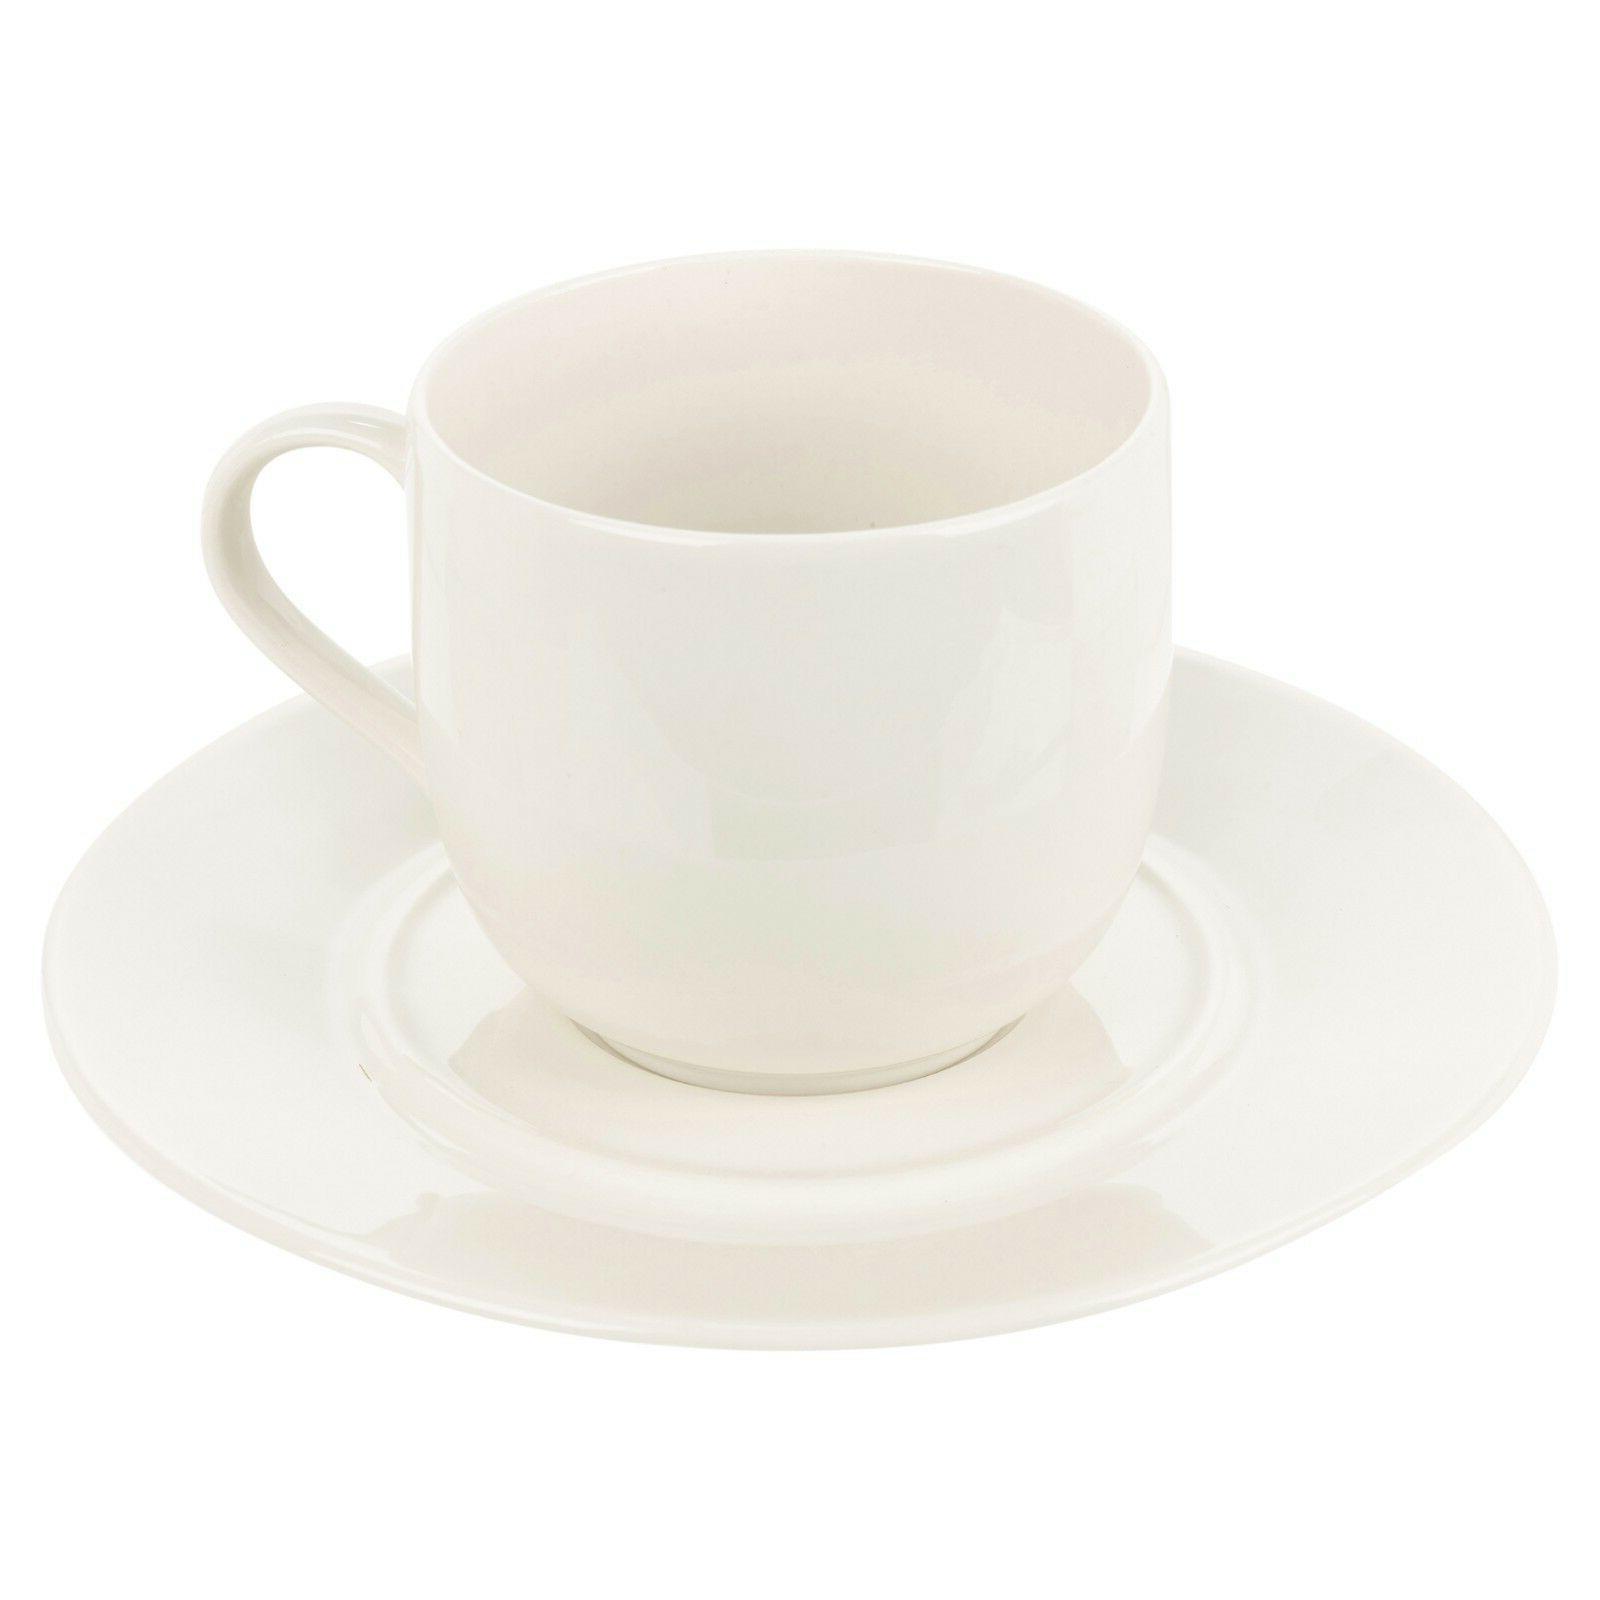 ALESSI La Bella Service Porcelain Tableware Plate Set